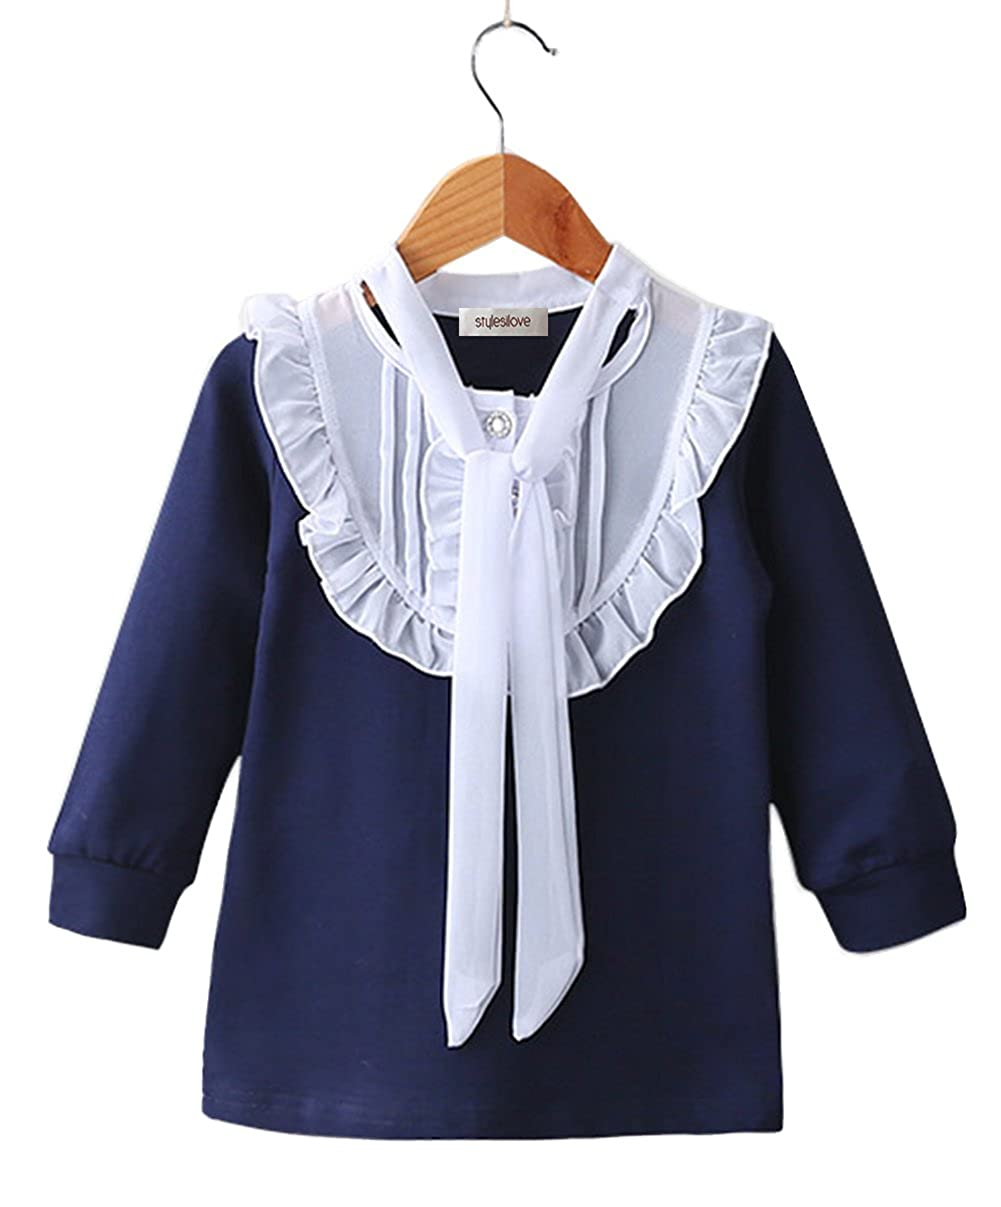 stylesilove Elegant Ruffle Tie Neck Little Girl Long Sleeve Cotton Blouse Top